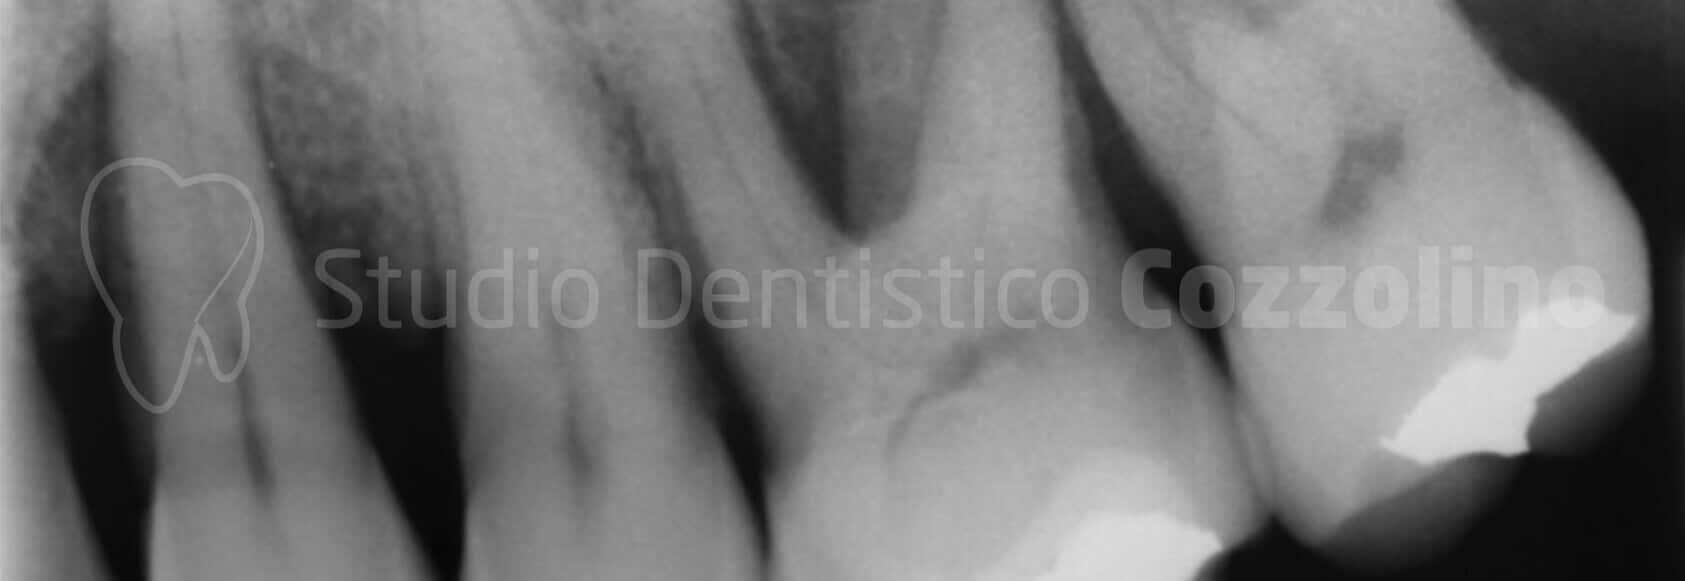 Ortopantomografia Arcate Parodontologia